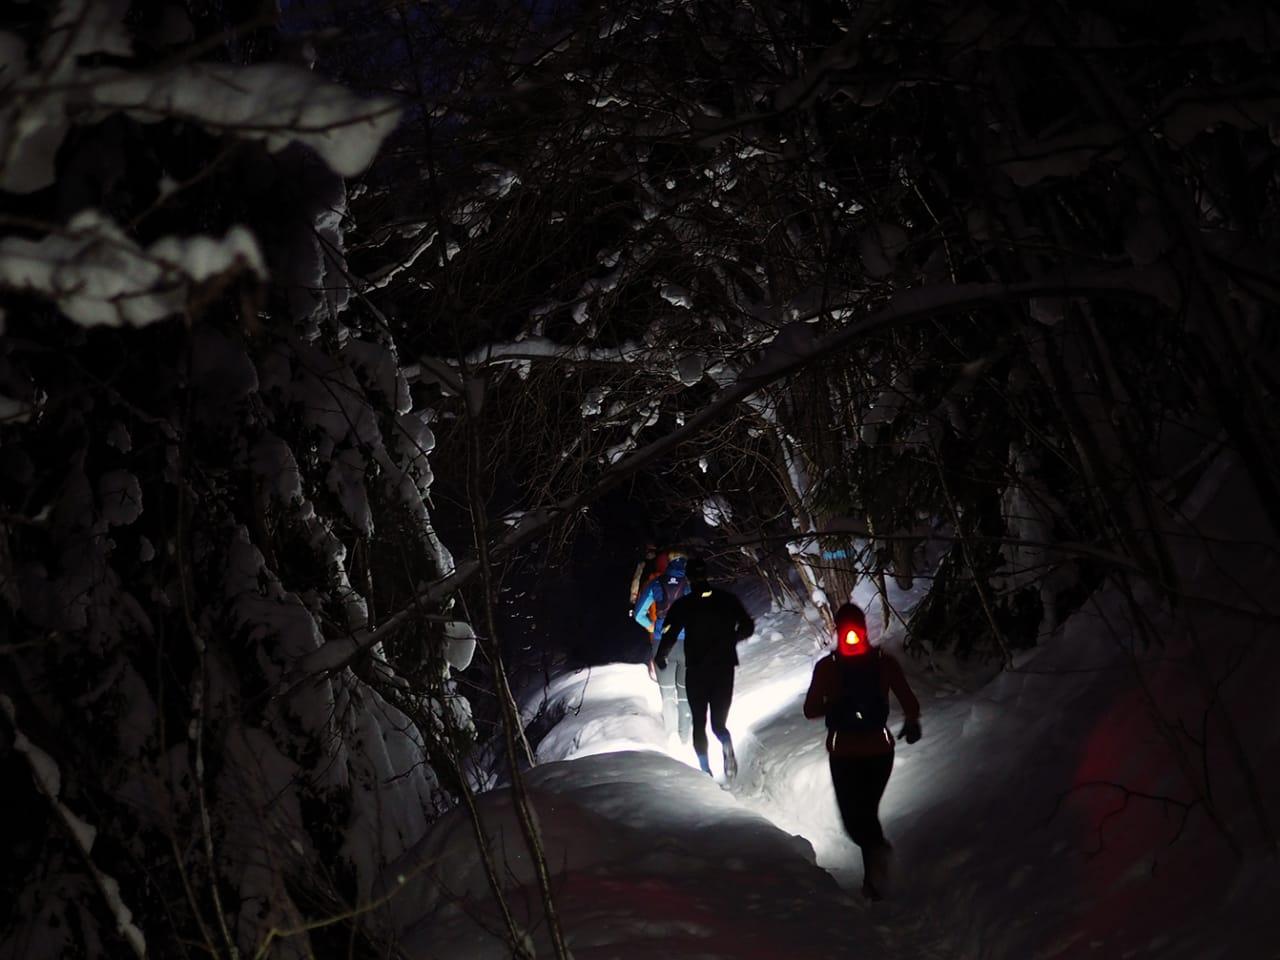 vinterløping-pudderløping-johannes rummelhoff_5